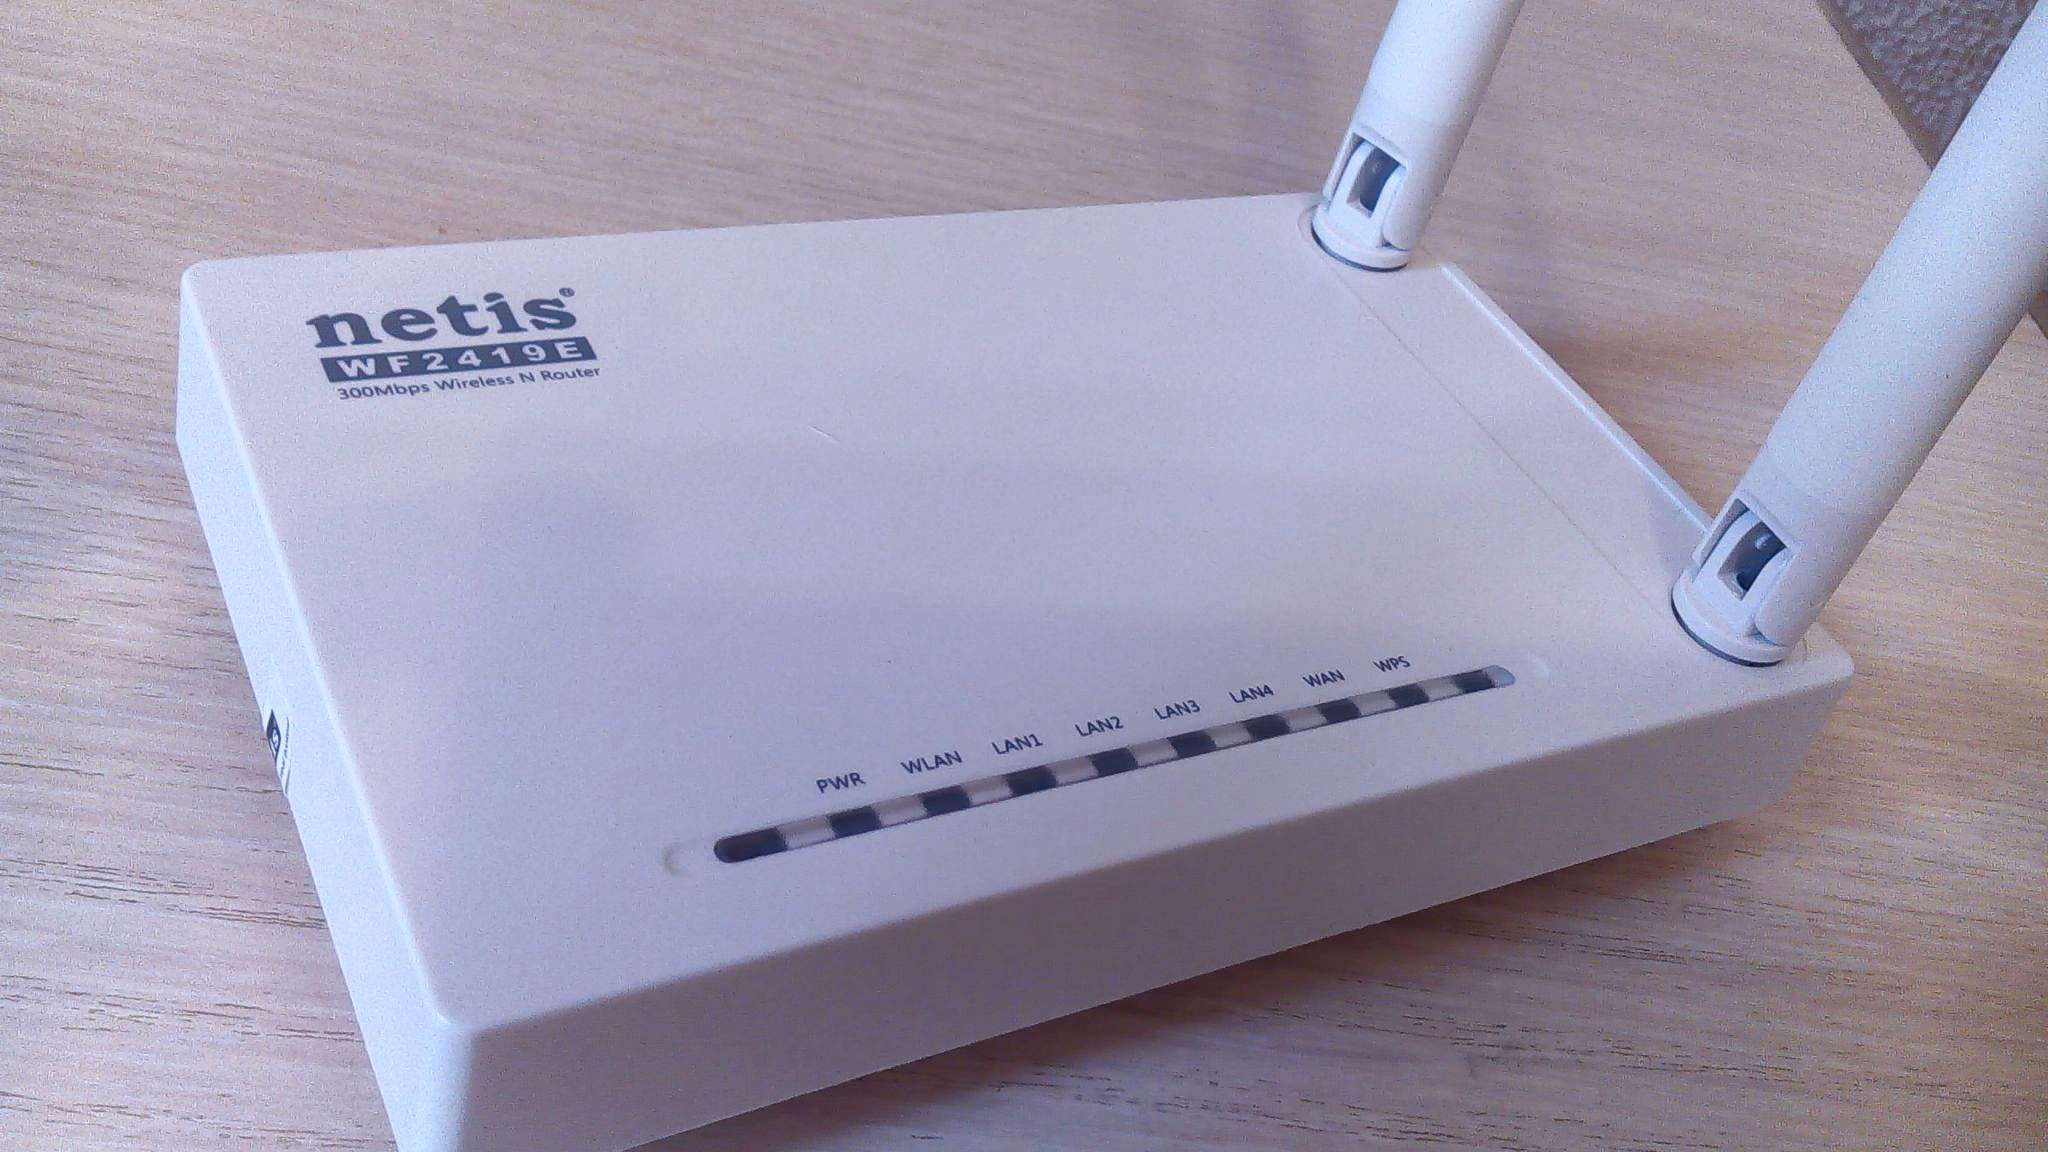 Wifi Netis Wf2419e 300mbps Wireless Router